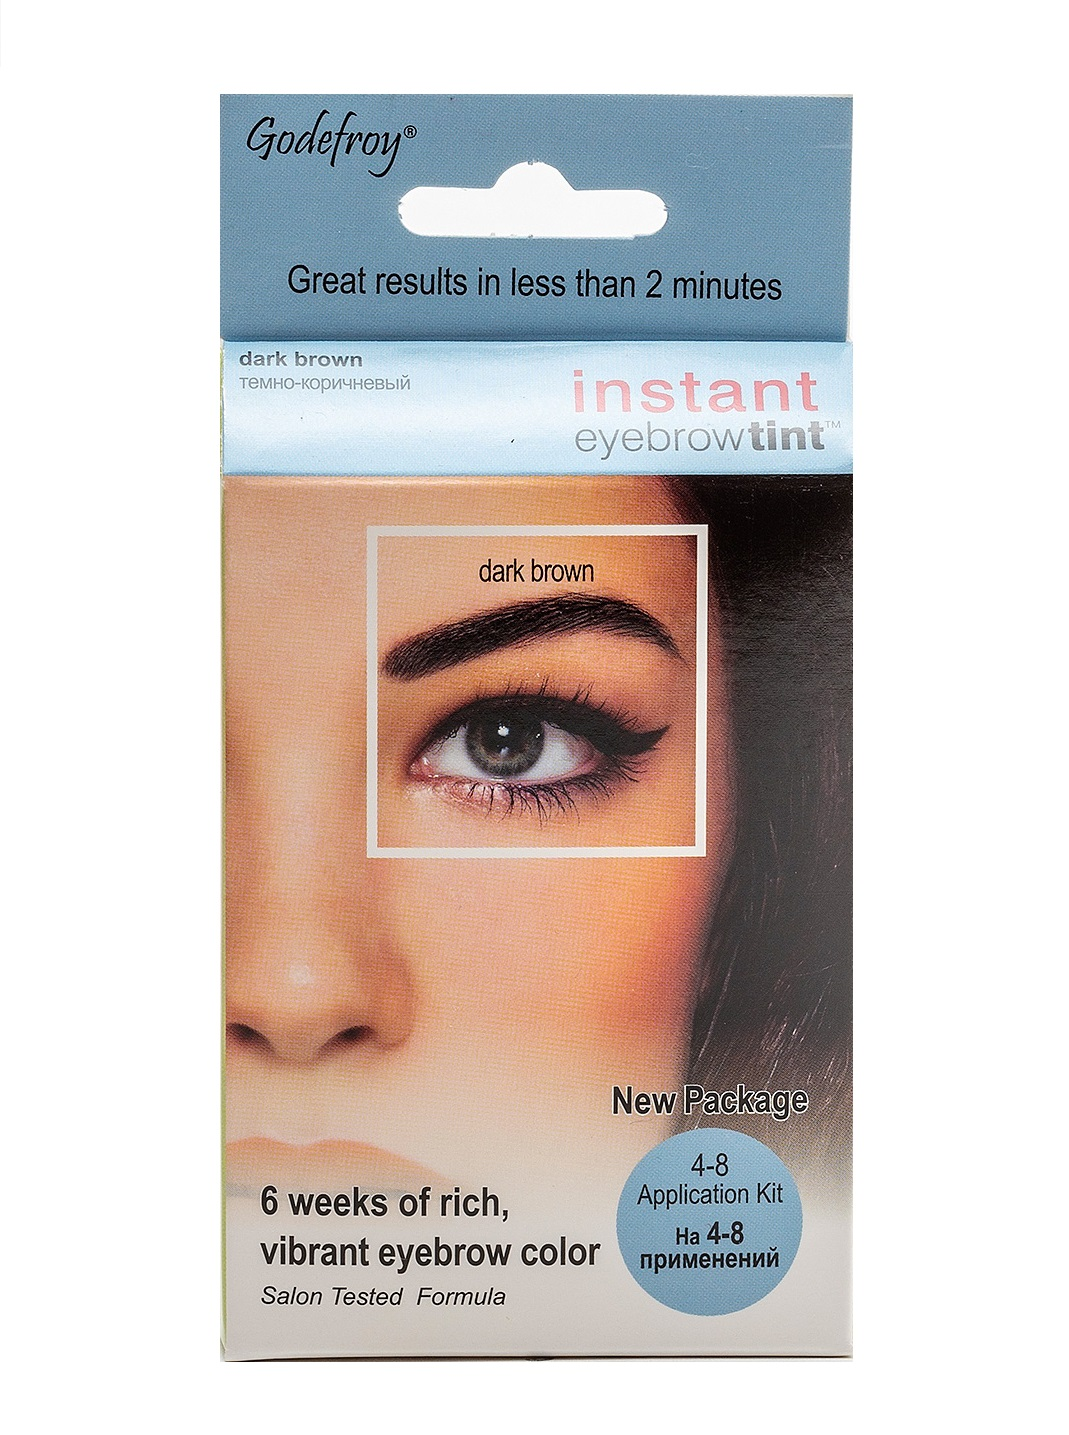 GODEFROY Краска-хна в капсулах для ресниц и бровей, набор (темно-кор.) 4 шт/ Godefroy Eyebrow Tint Dark Brown